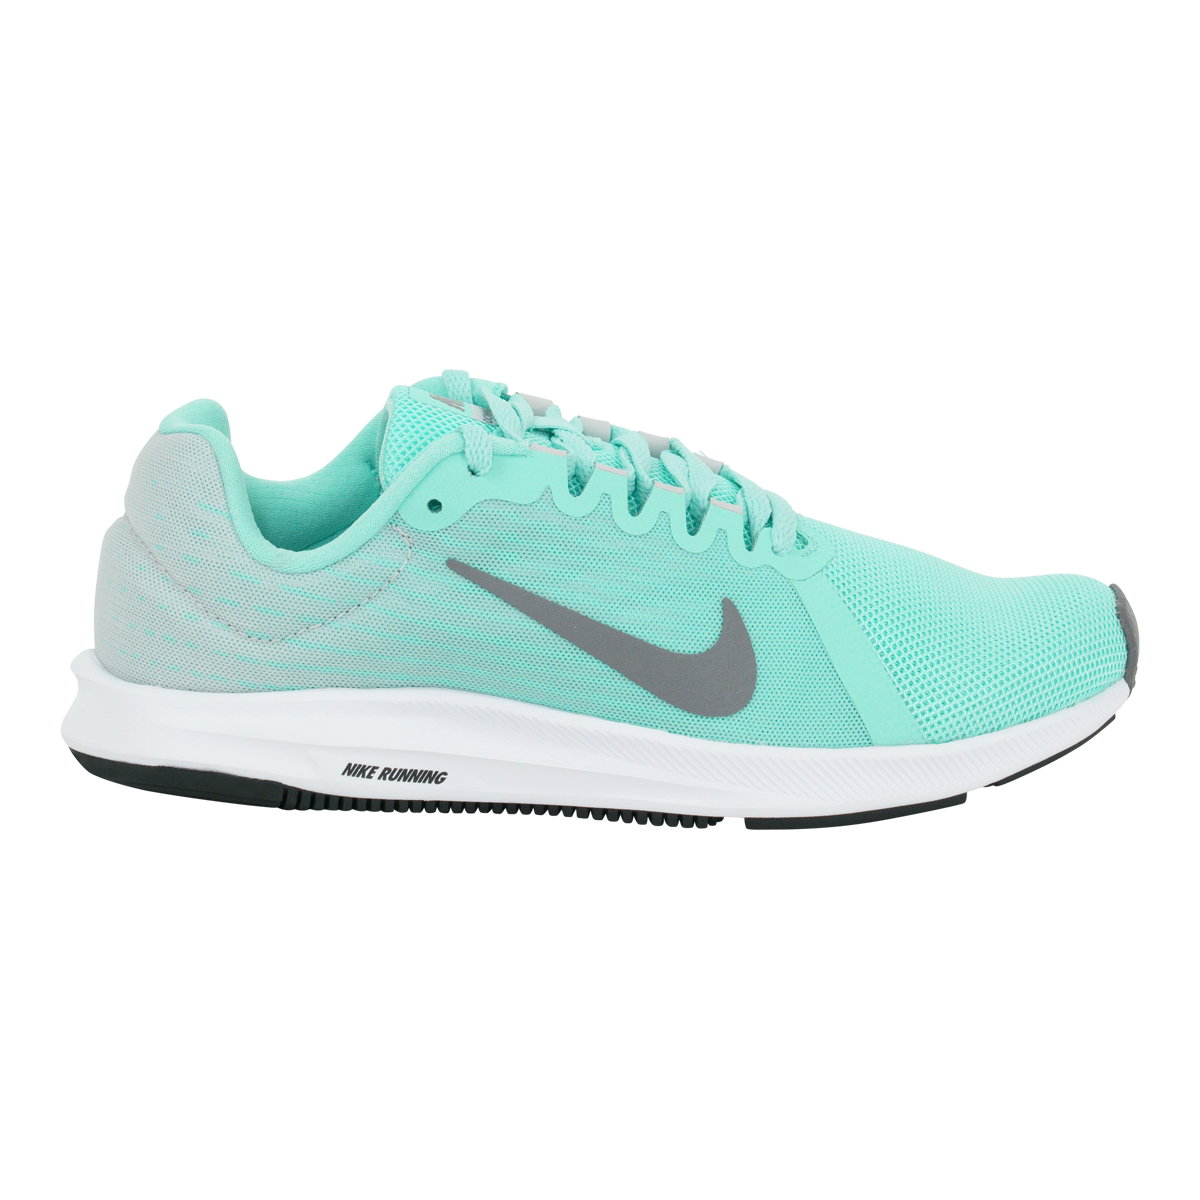 China obturador veneno  Nike Women's Downshifter 8 Running Shoes Emerald Rise/Gunsmoke-Vast  Grey-Black 5 | eBay